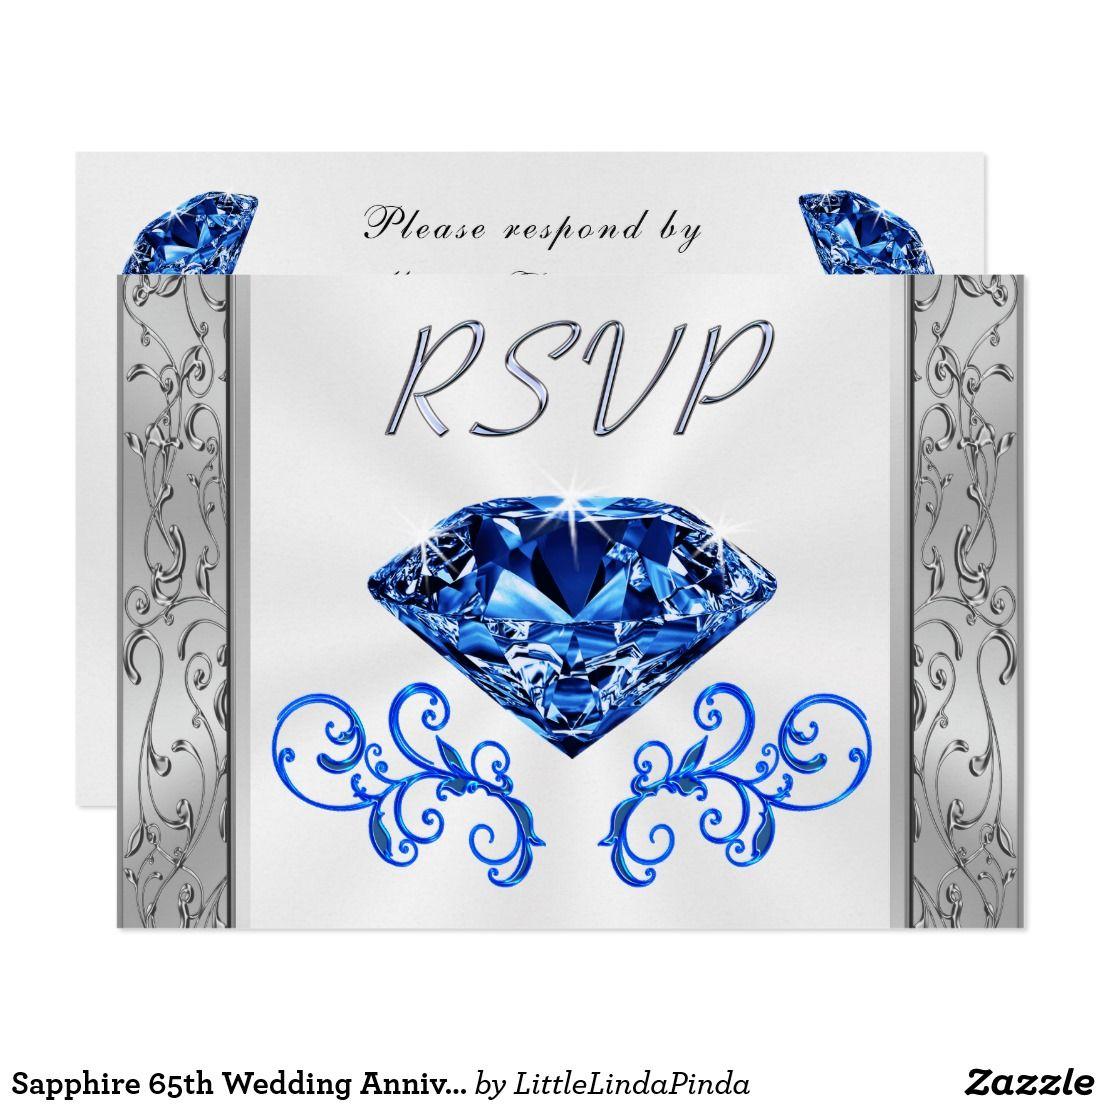 Sapphire 65th Wedding Anniversary RSVP Cards